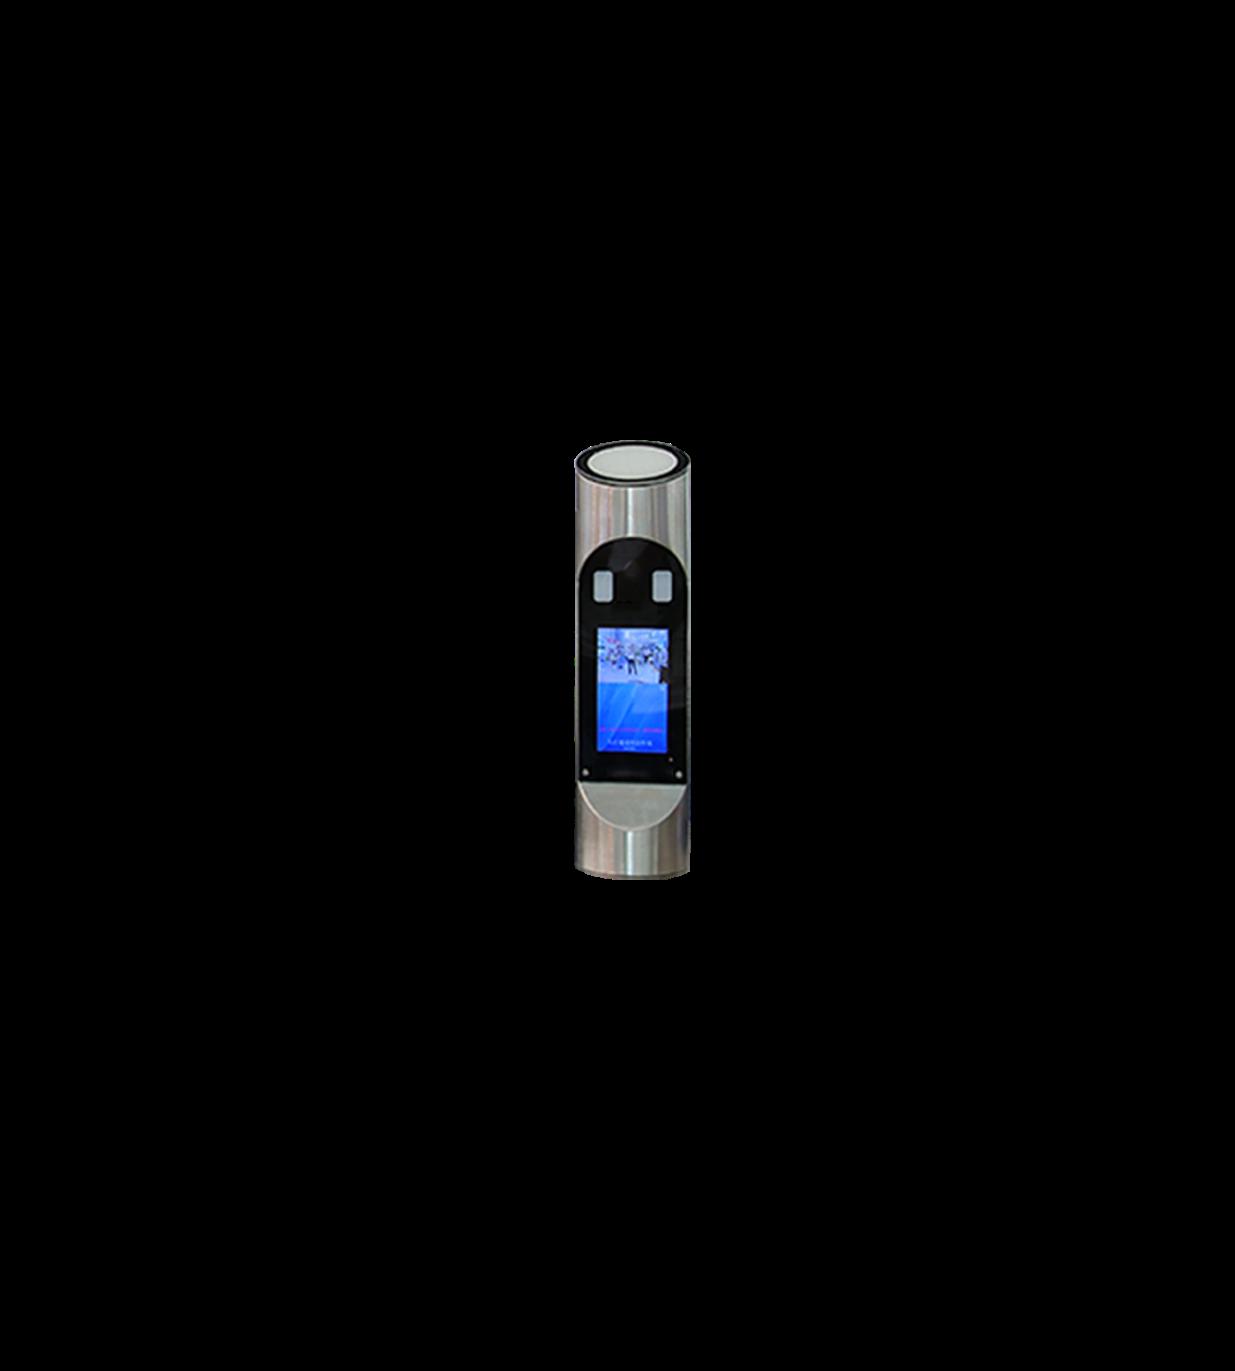 CY-RL03人脸识别E世博app机